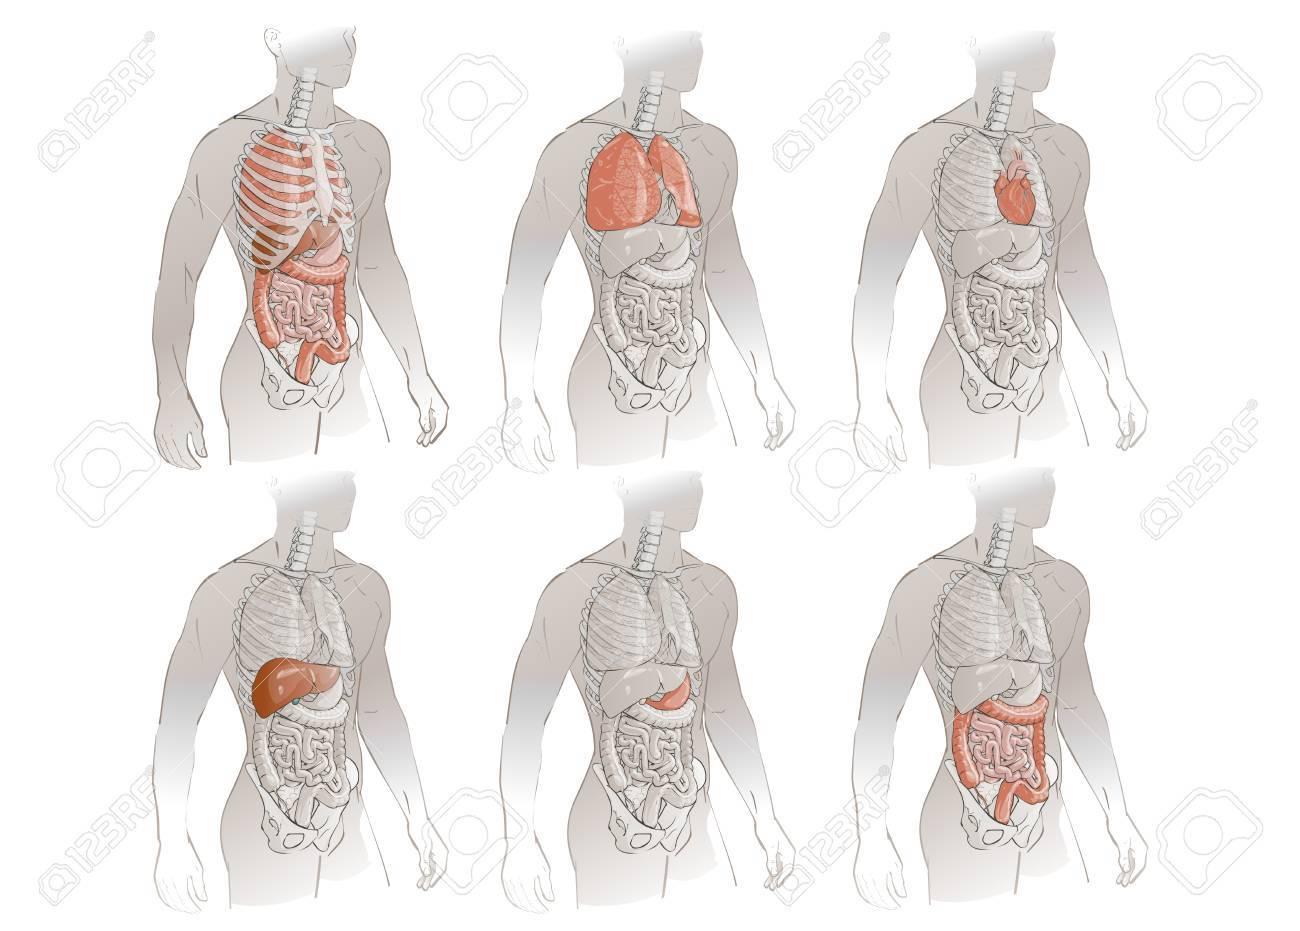 Illustration Human Body Anatomy Medical Internal Organs System ...